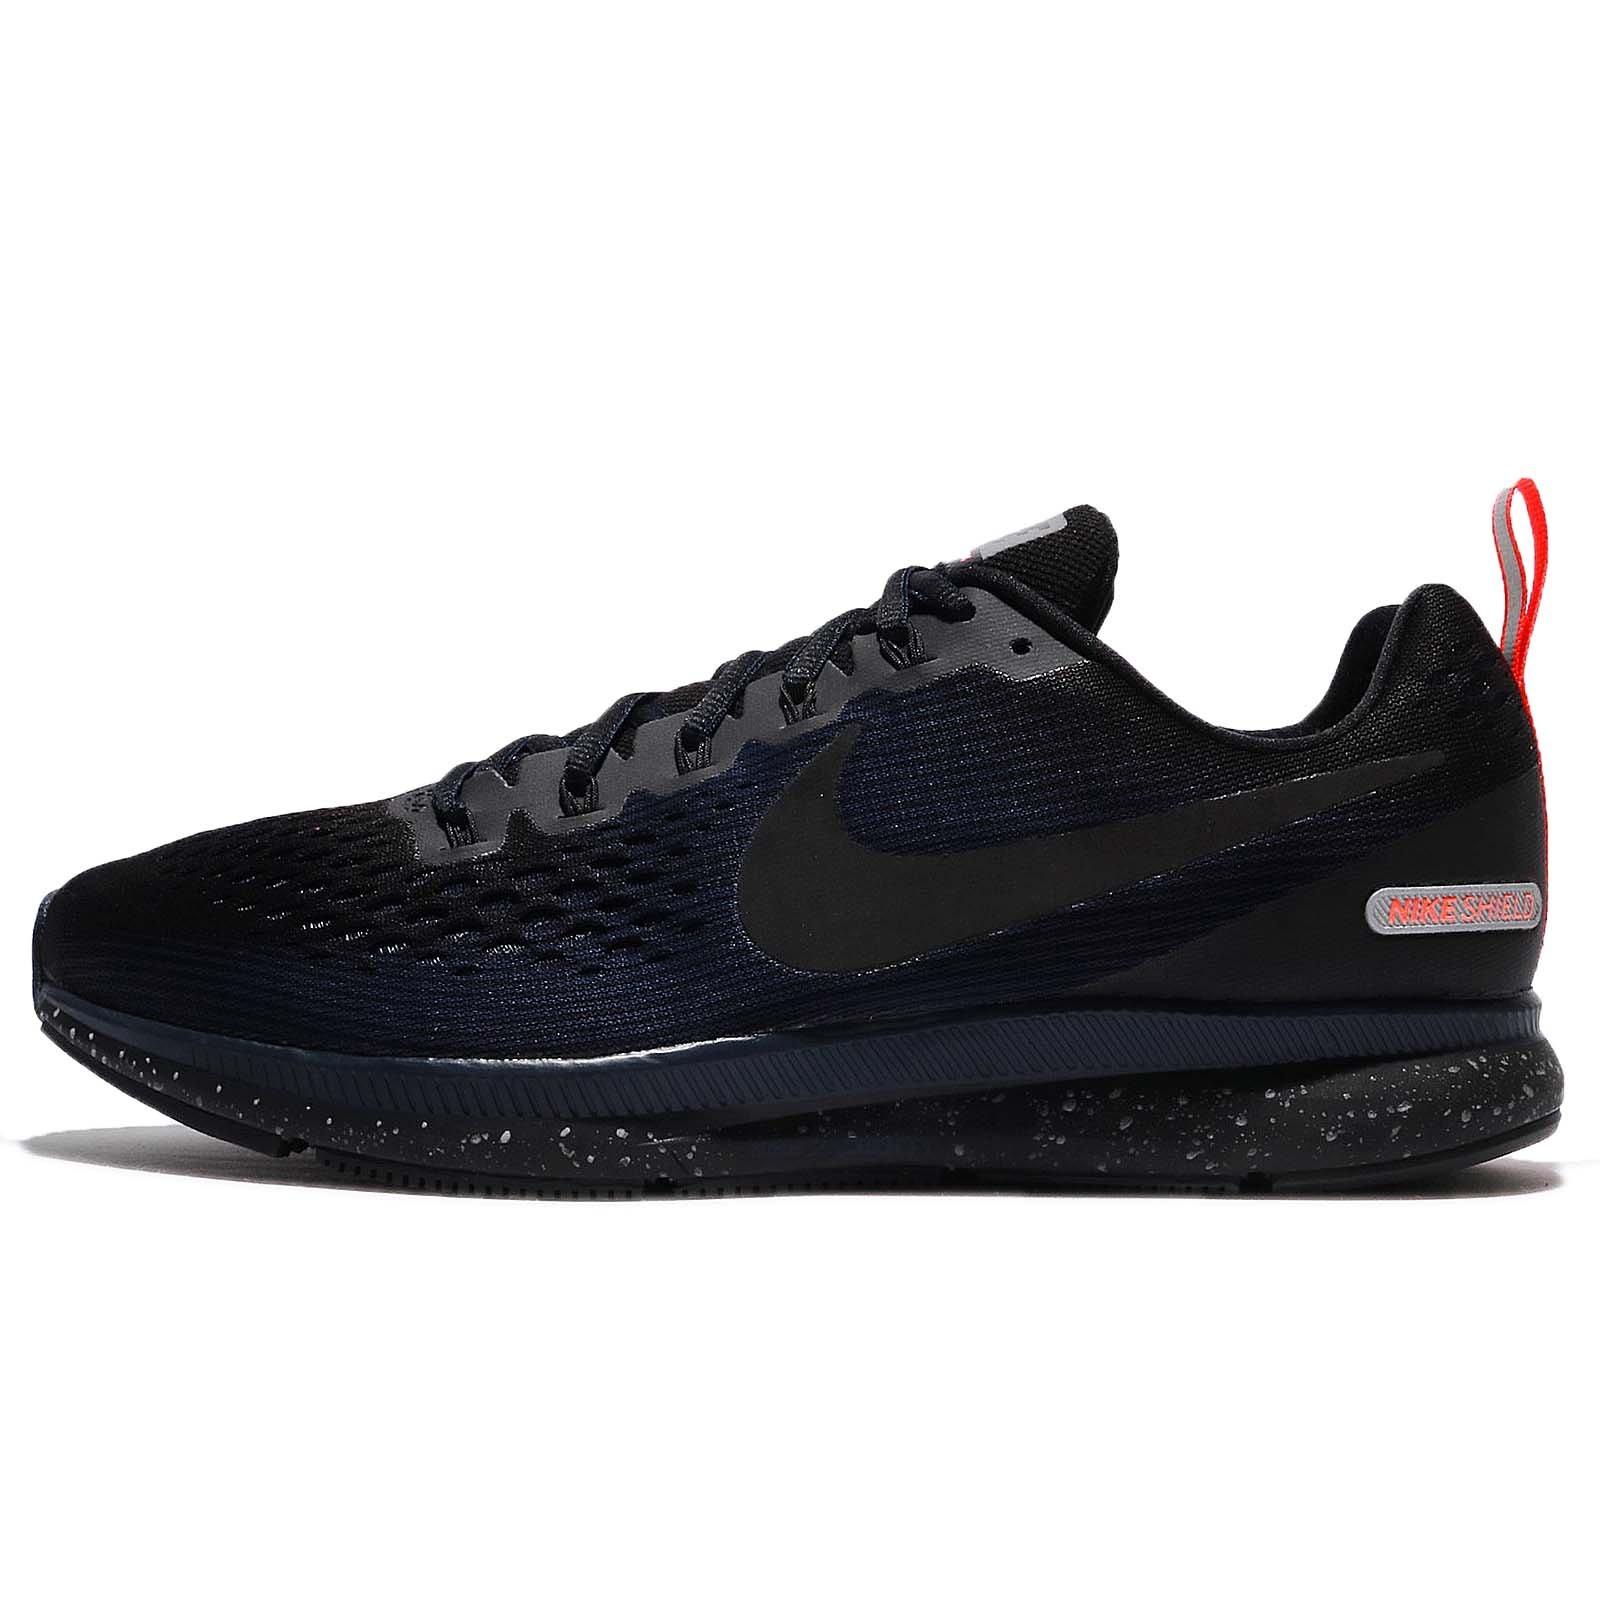 best sneakers 5f12b 54e95 Galleon - Nike Men s Air Zoom Pegasus 34 Shield Running Shoe Black Black- Black-Obsidian 12.5